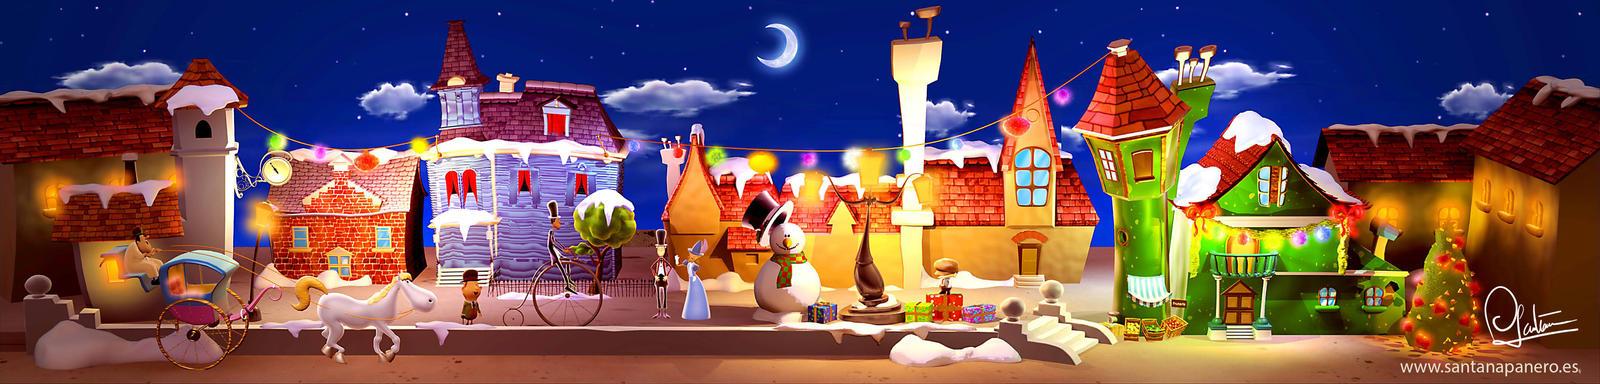 Charles Dickens Christmas Street by TrasnoLume